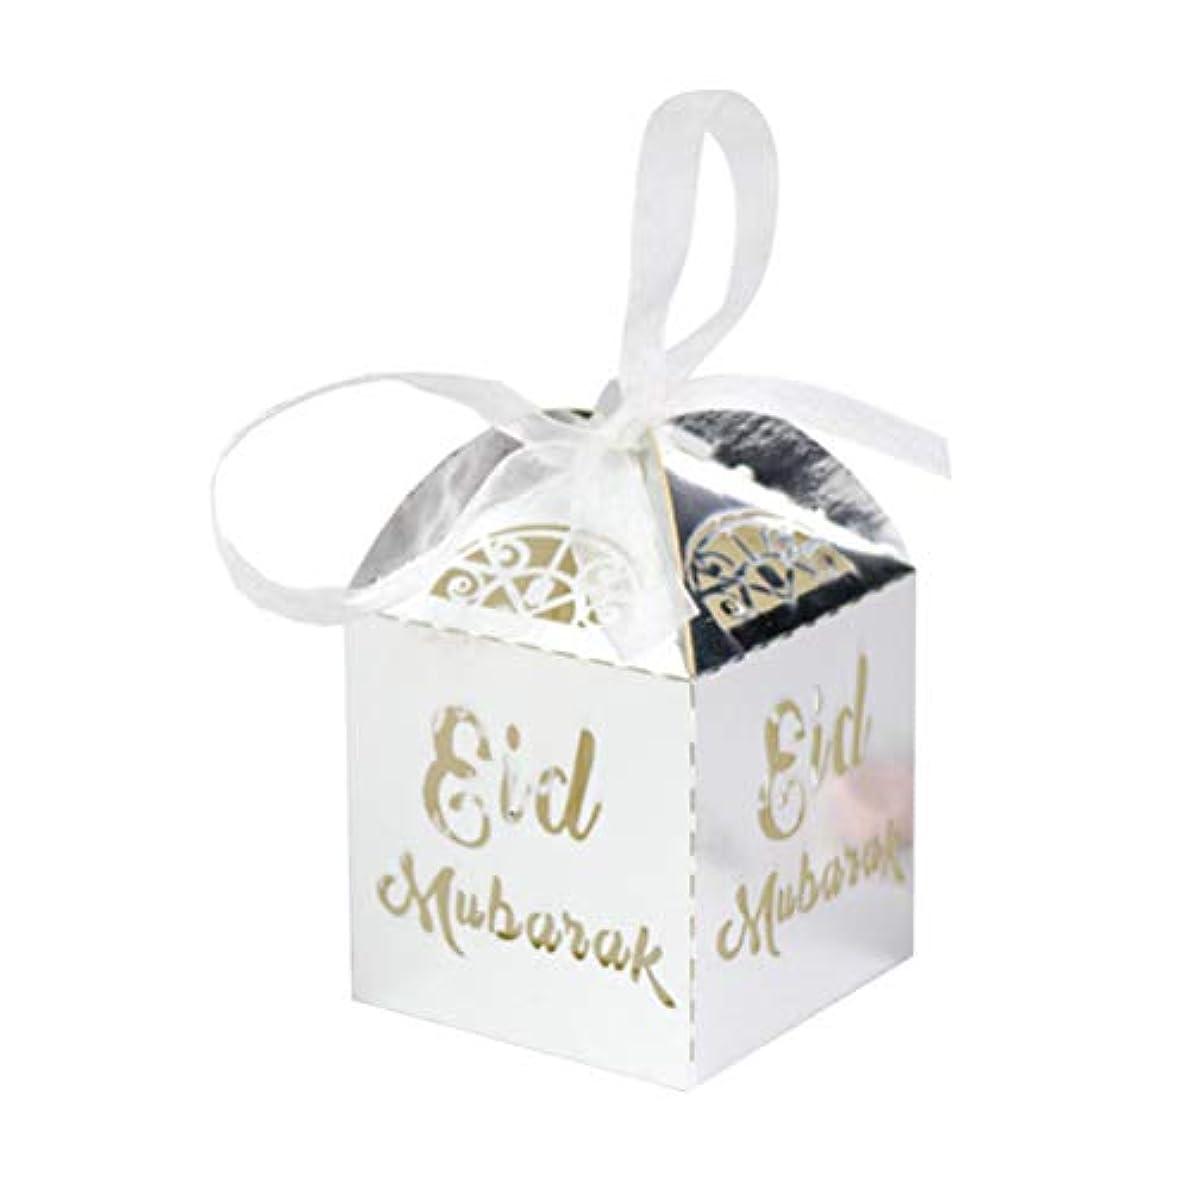 Amosfun 10pcs Gift Boxes Eid Mubarak Hollow Candy Chocolate Decorative Box for Muslim Ramadan Festival Tray Wedding Party Birthday Decor (Silver) bvlhnd8806